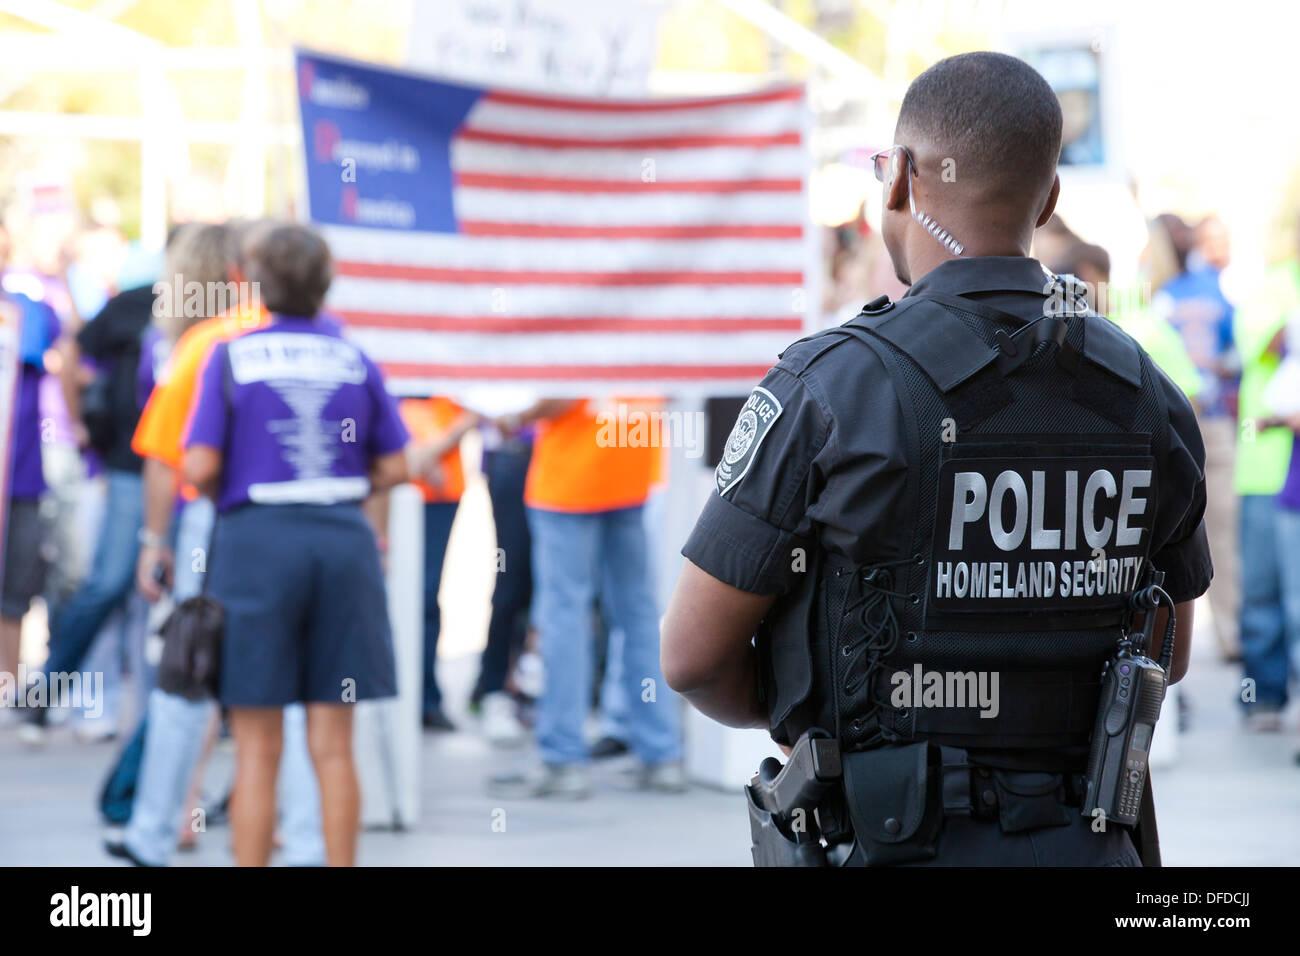 US Homeland Security (Federal Protective Service) policeman monitoring a demonstration - Washington, DC USA Stock Photo